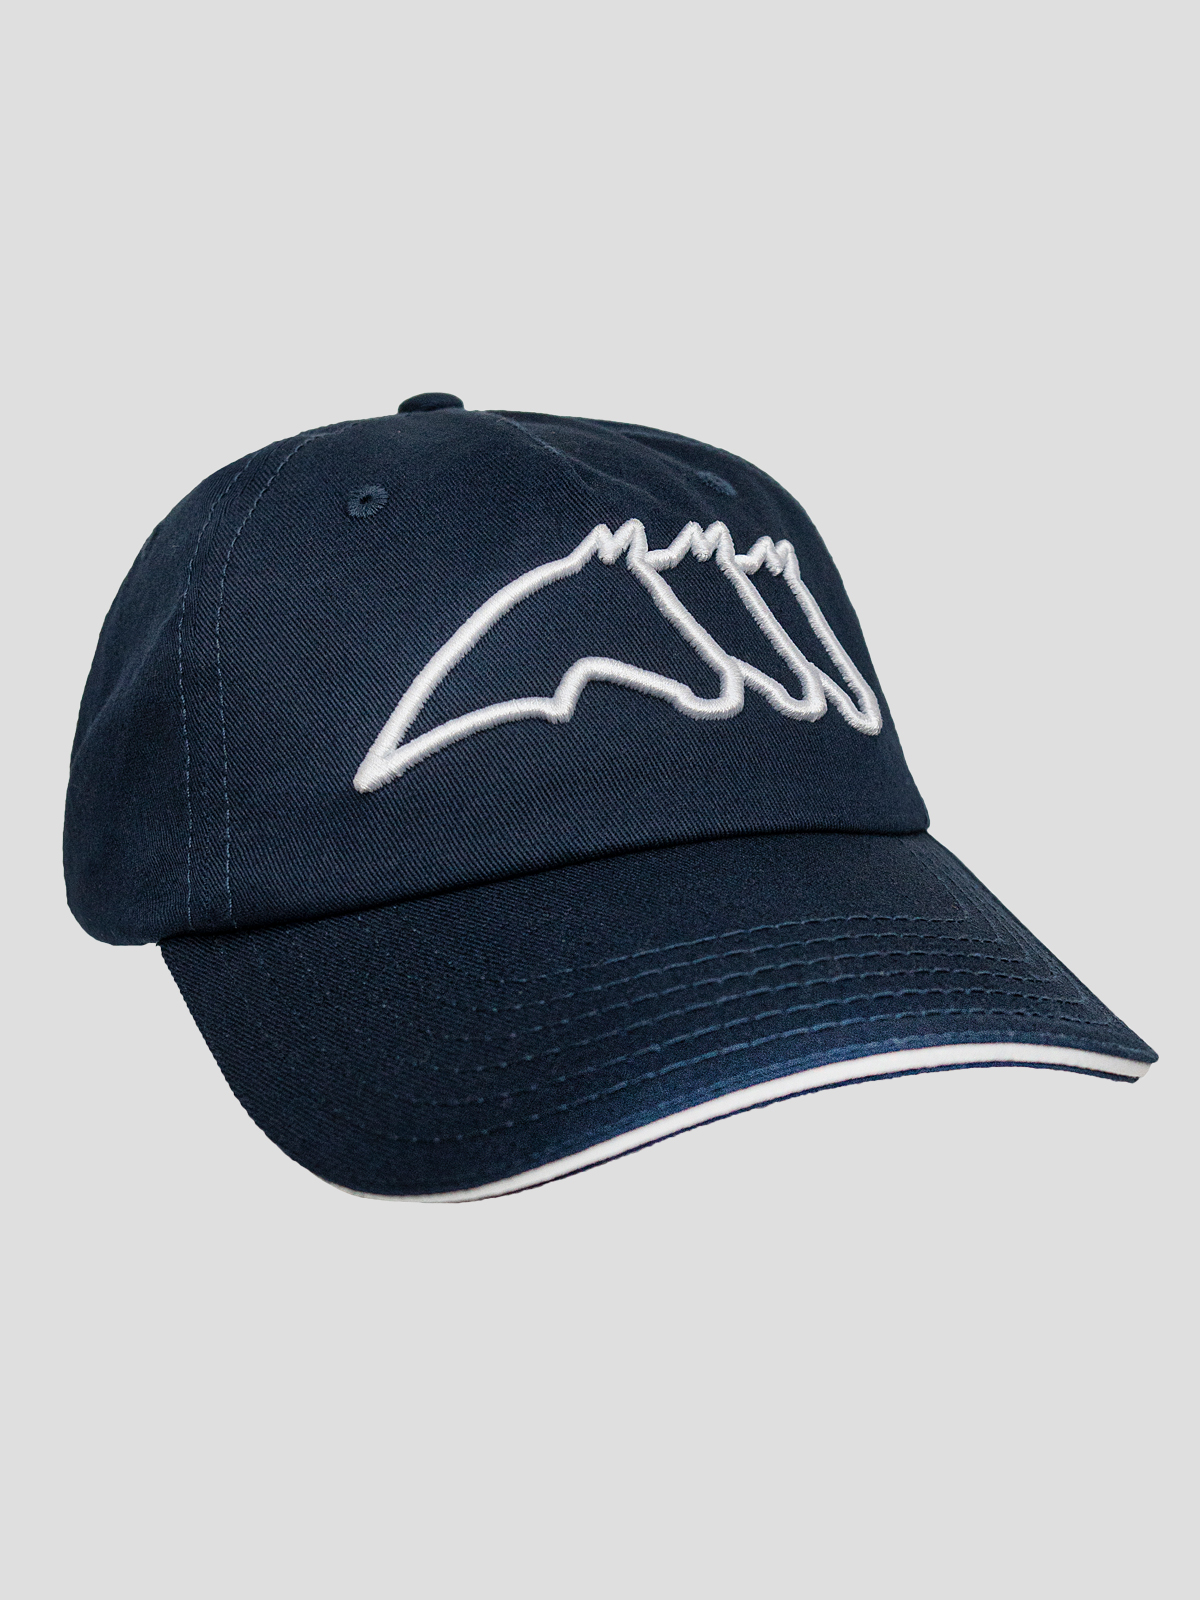 OSCARK BASEBALL CAP 1